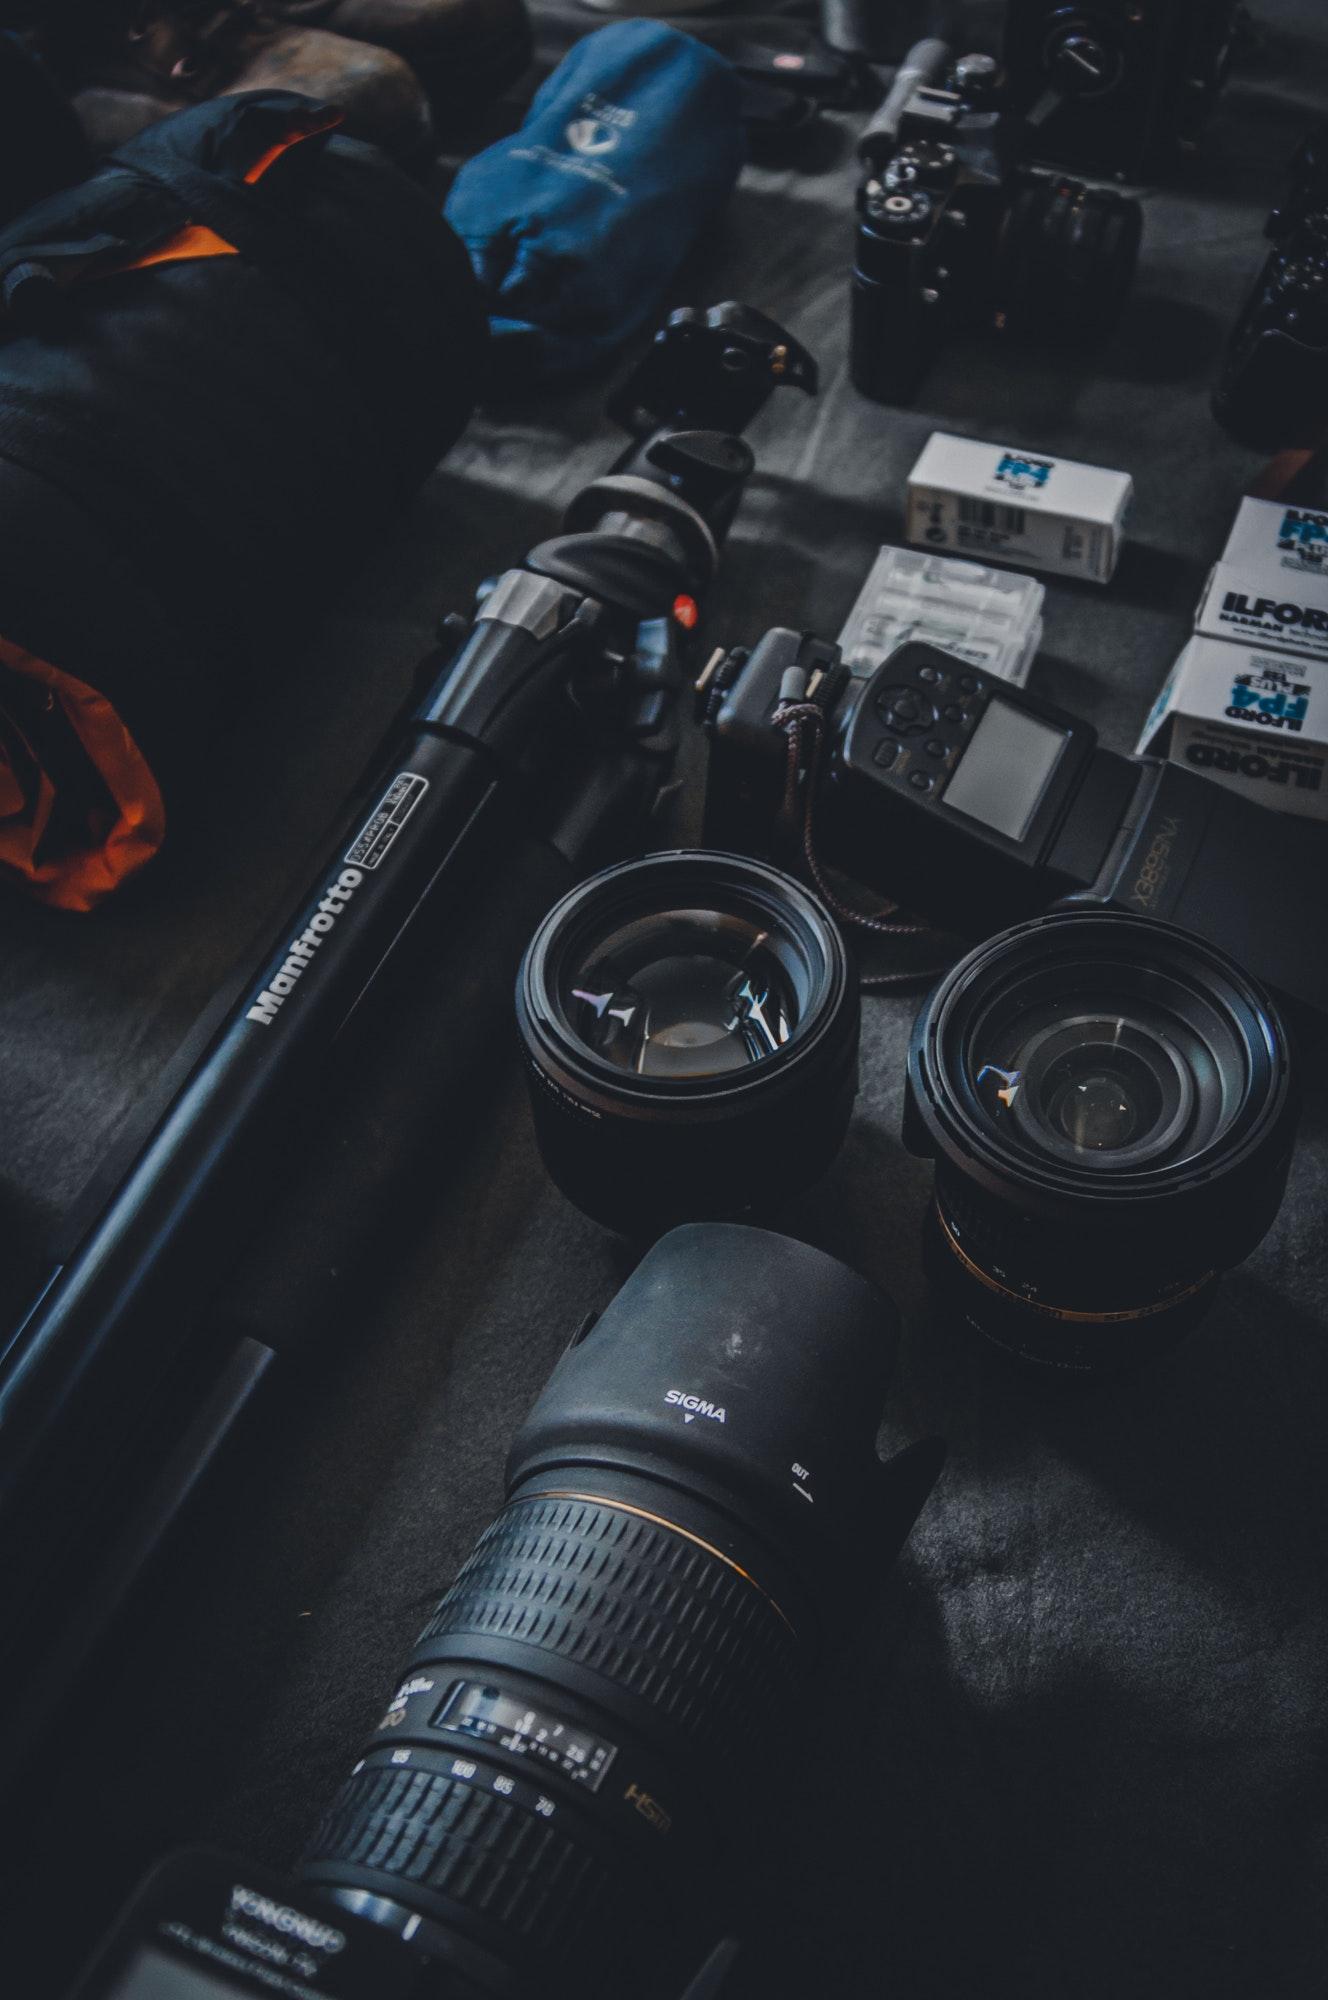 camera-close-up-device-821749.jpg